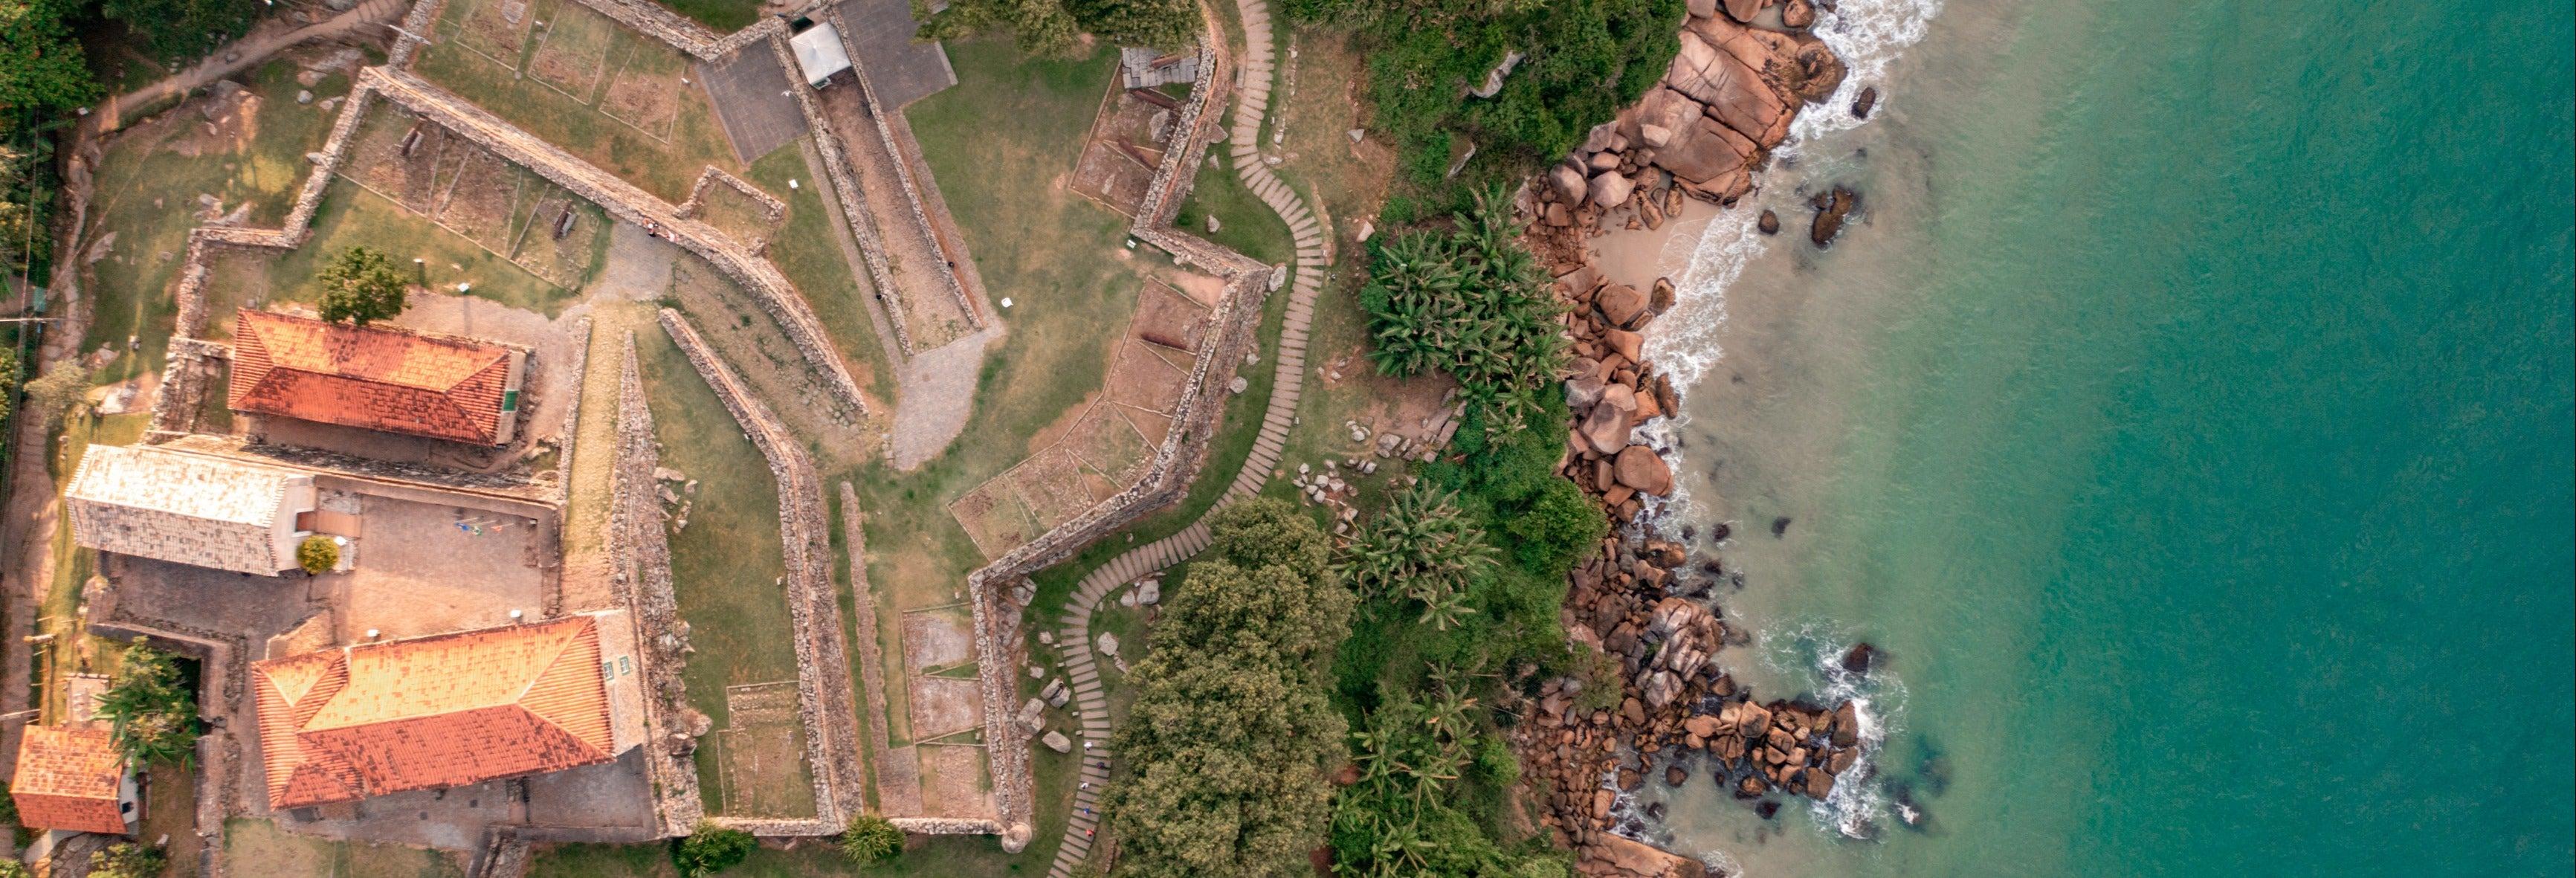 Snorkel en Praia do Forte